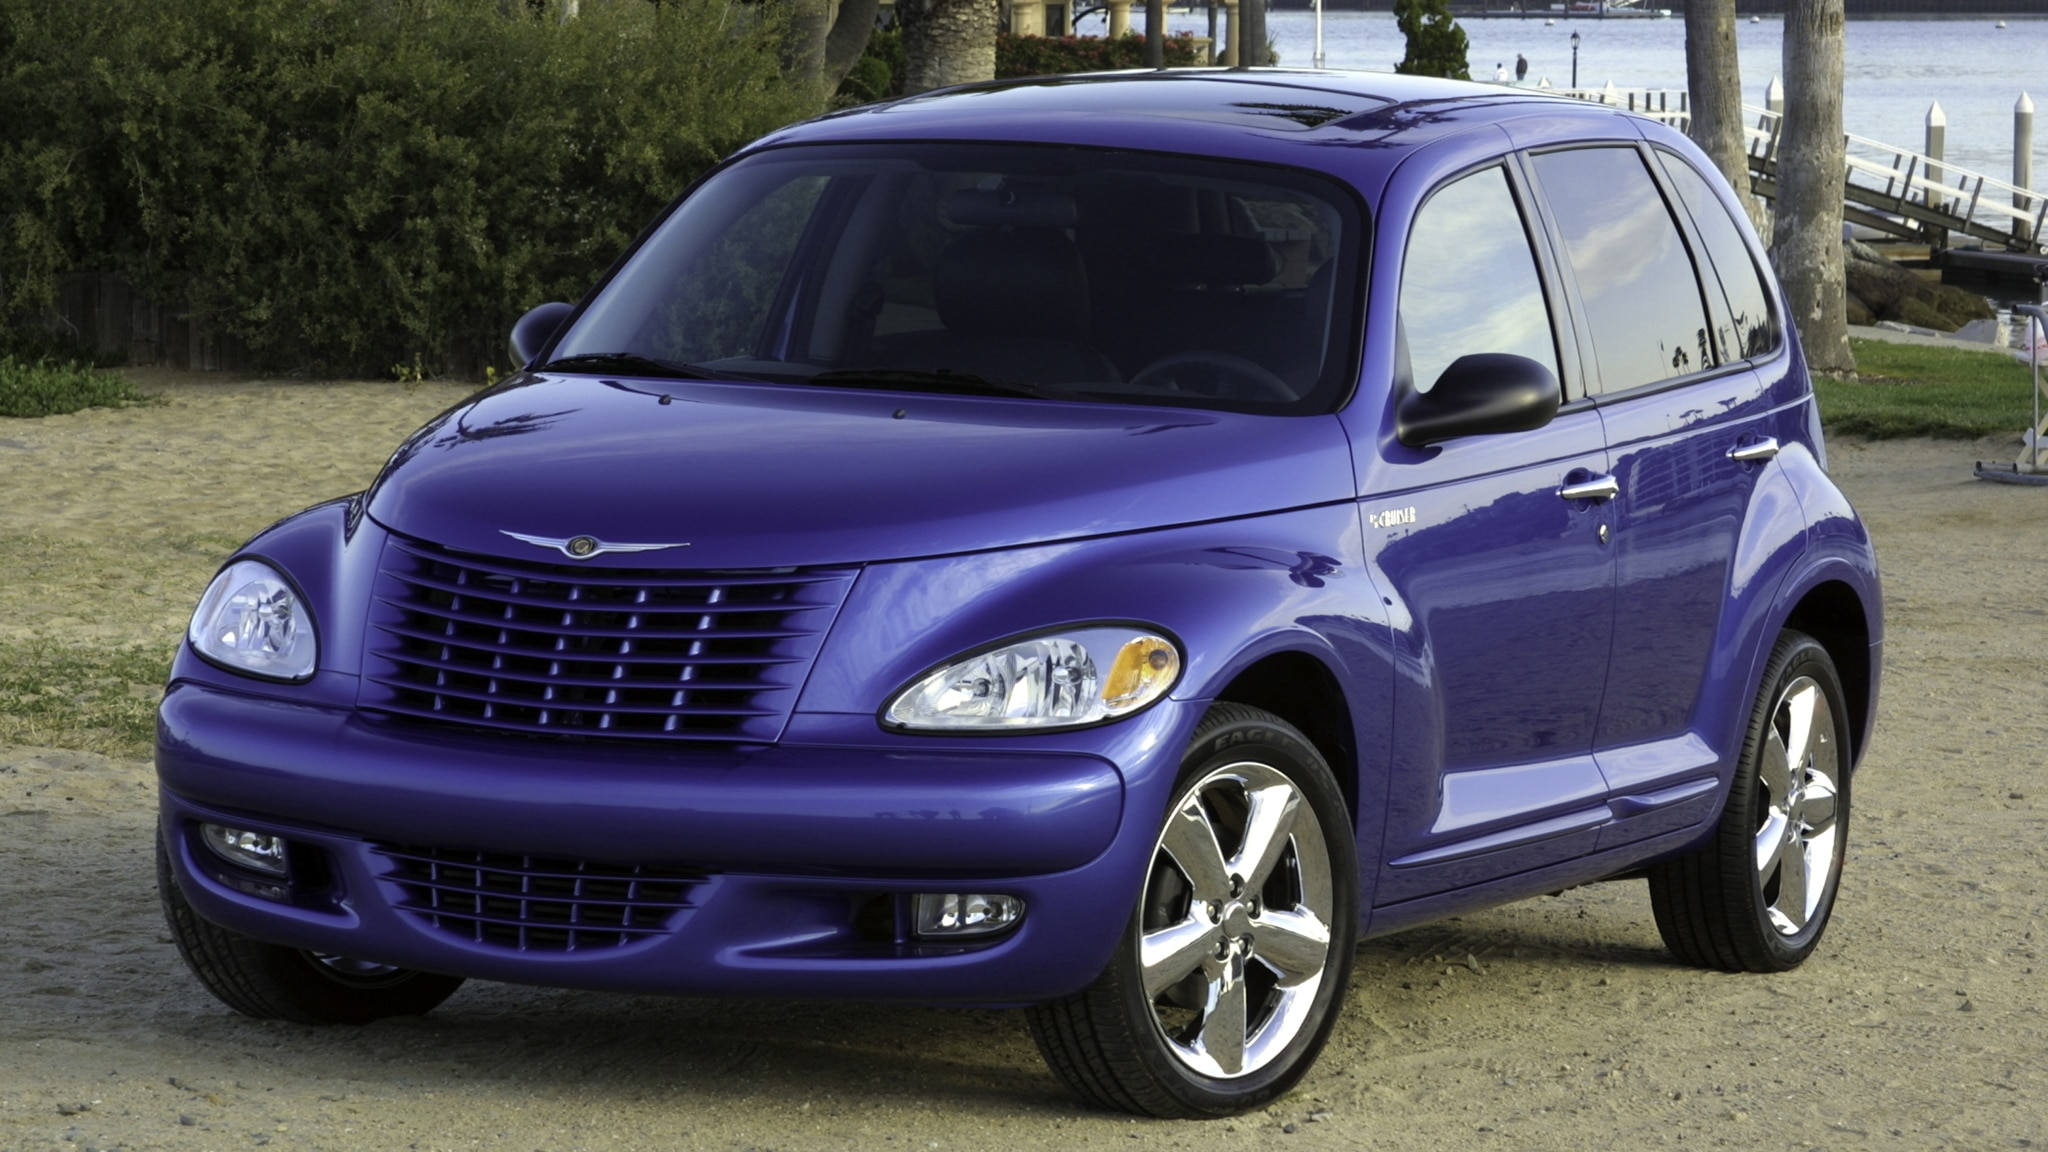 Kelebihan Chevrolet Pt Cruiser Perbandingan Harga